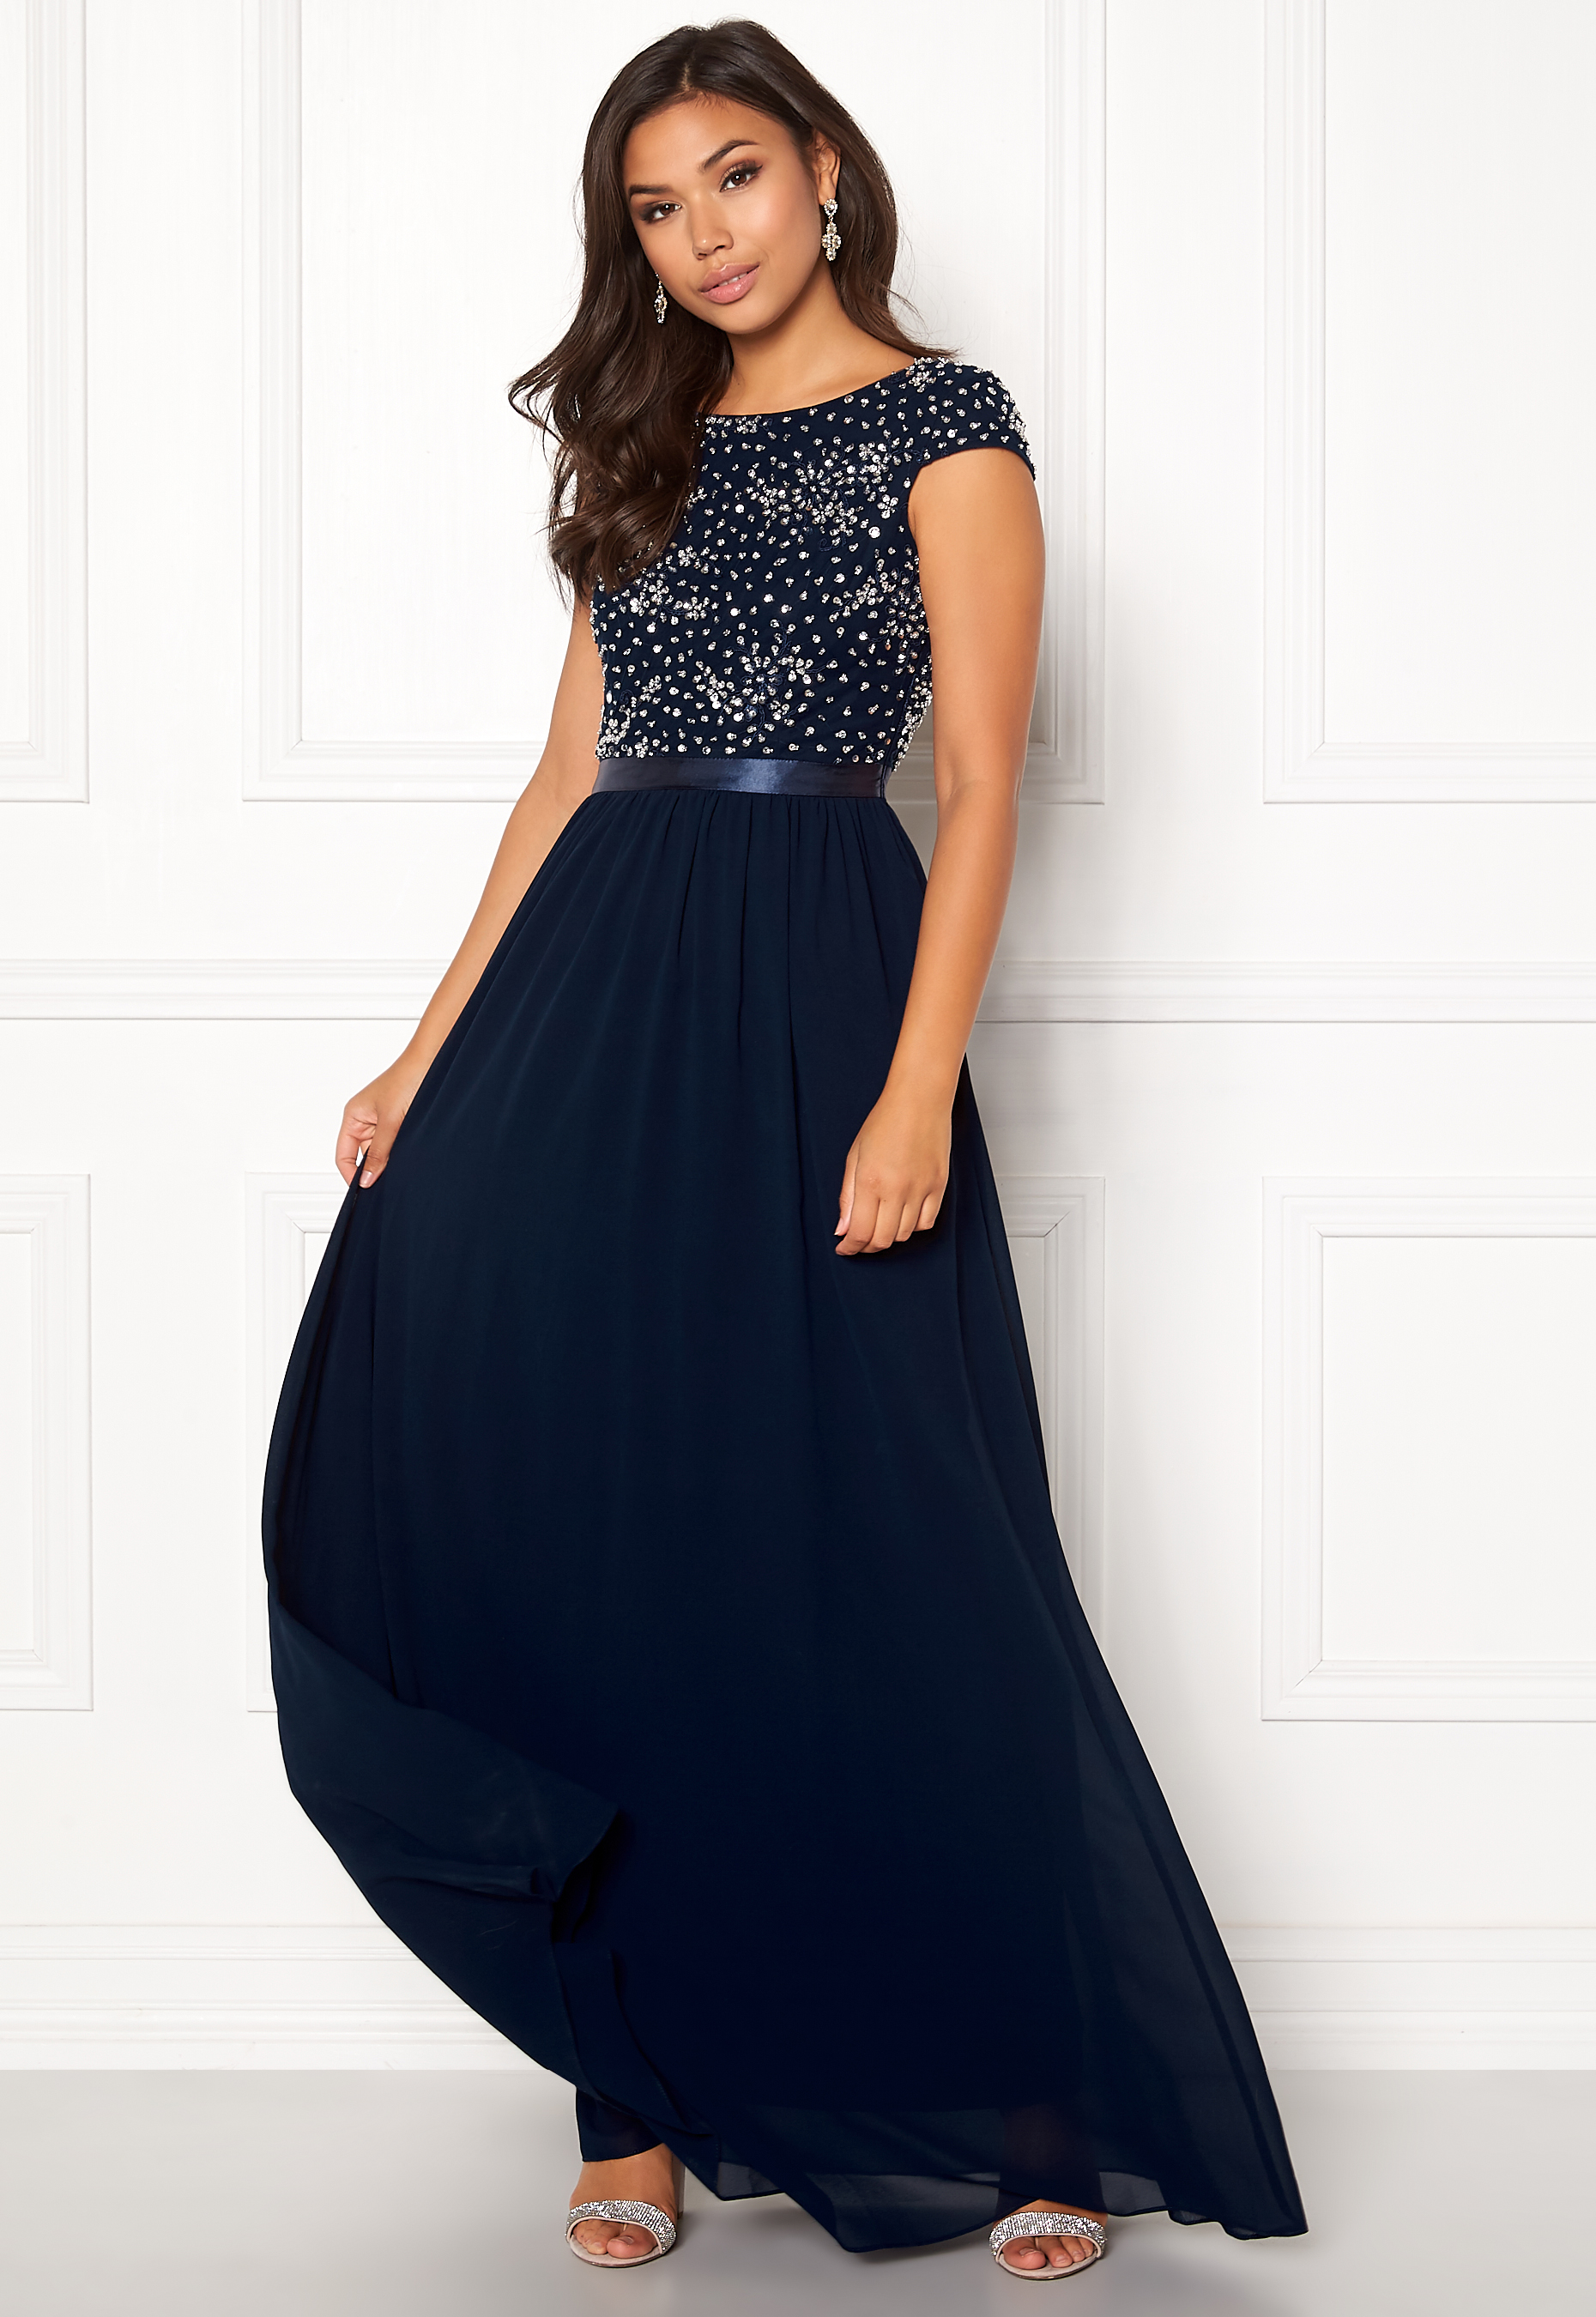 0bce4240 Deep V Neck Metallic Dress Gold. CHIARA FORTHI. Viviere Sparkling Gown  Midnight Blue. ZETTERBERG COUTURE. Stella Dress Ivory/Nude